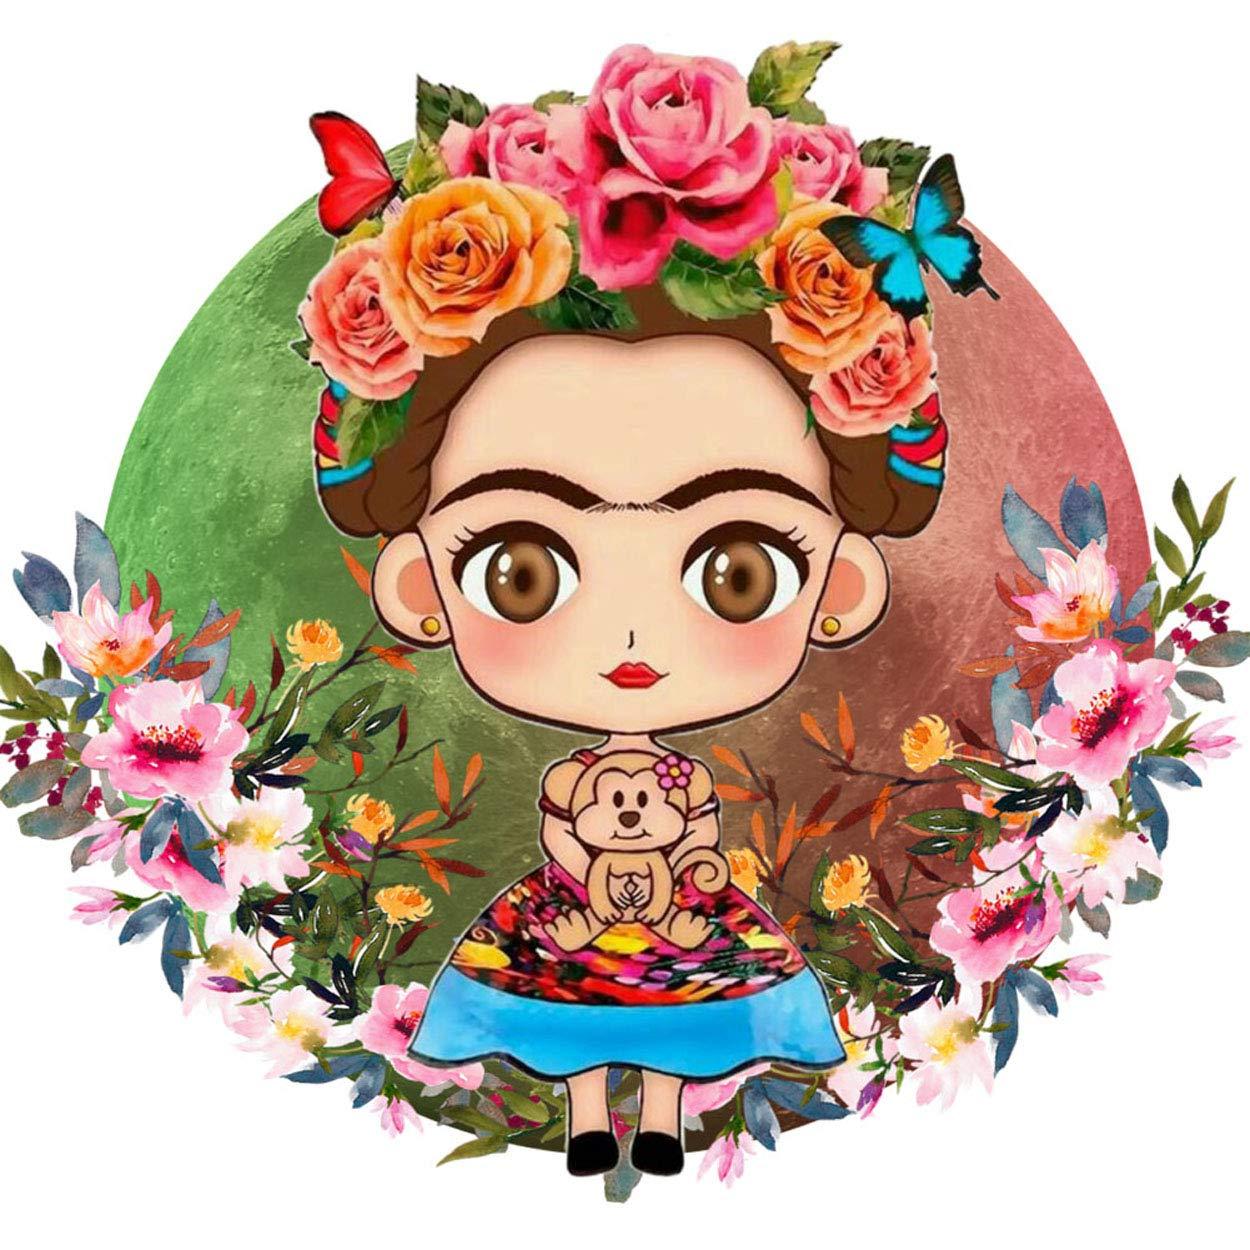 Amazon.com: Argonv Frida Kahlo - Parche termoadhesivo ...